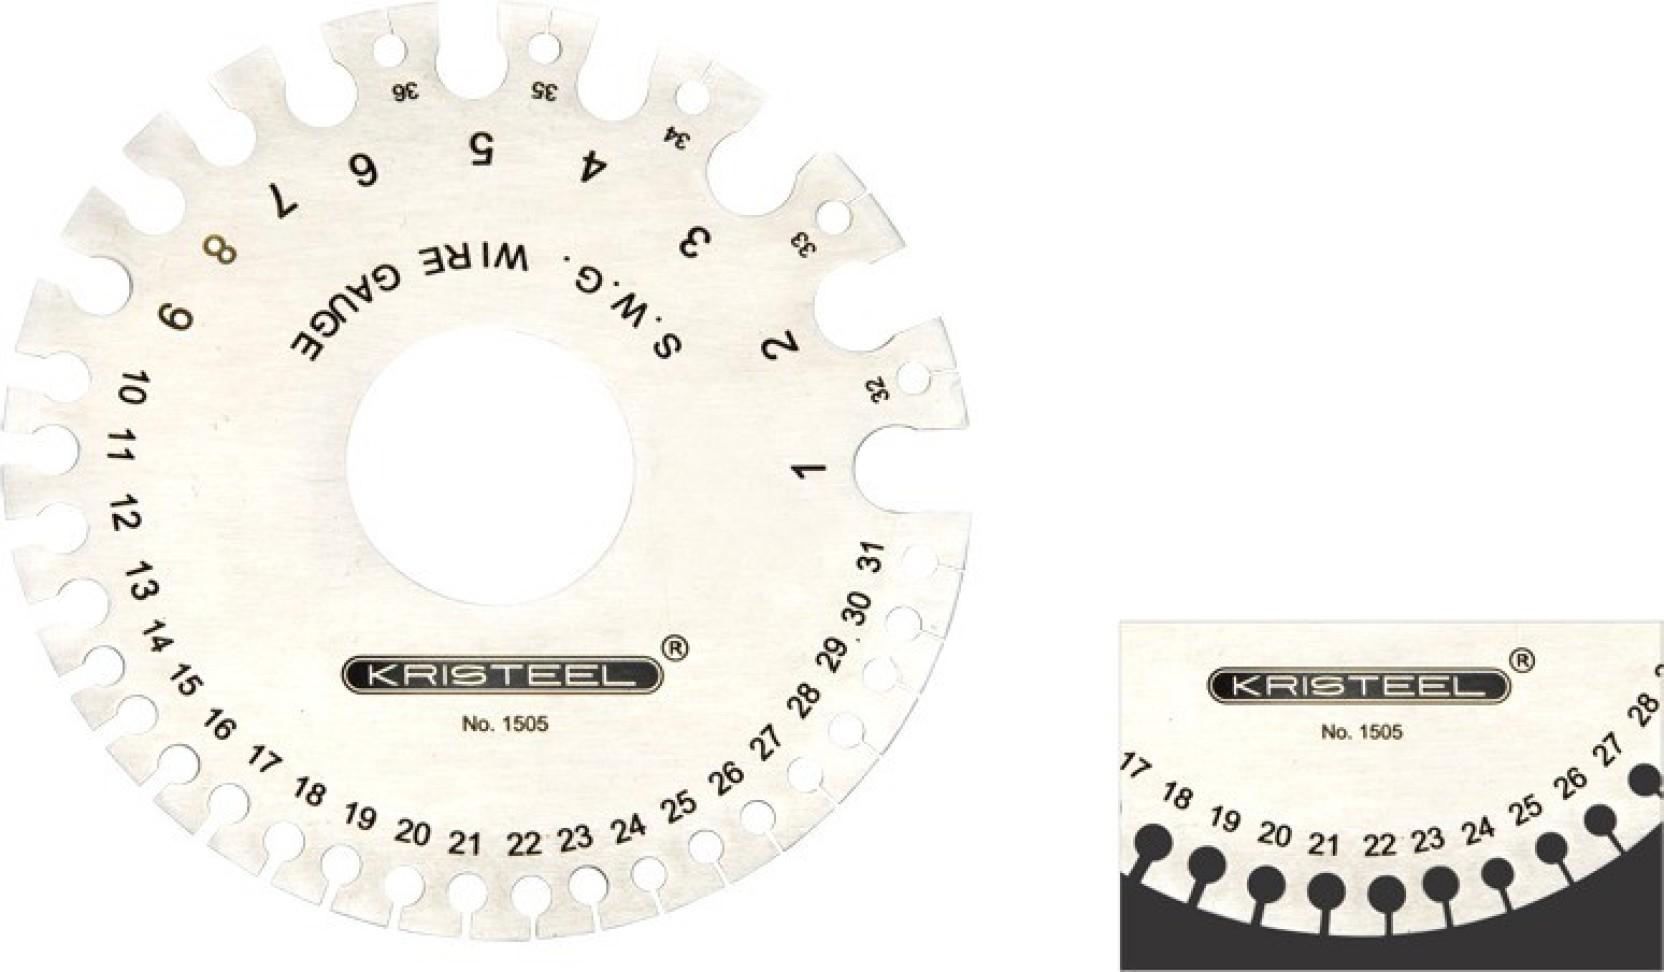 Kristeel Swg Round Wire Gauge Multiple Unit Measuring Fuel Wiring Diagram Diamante Wheel